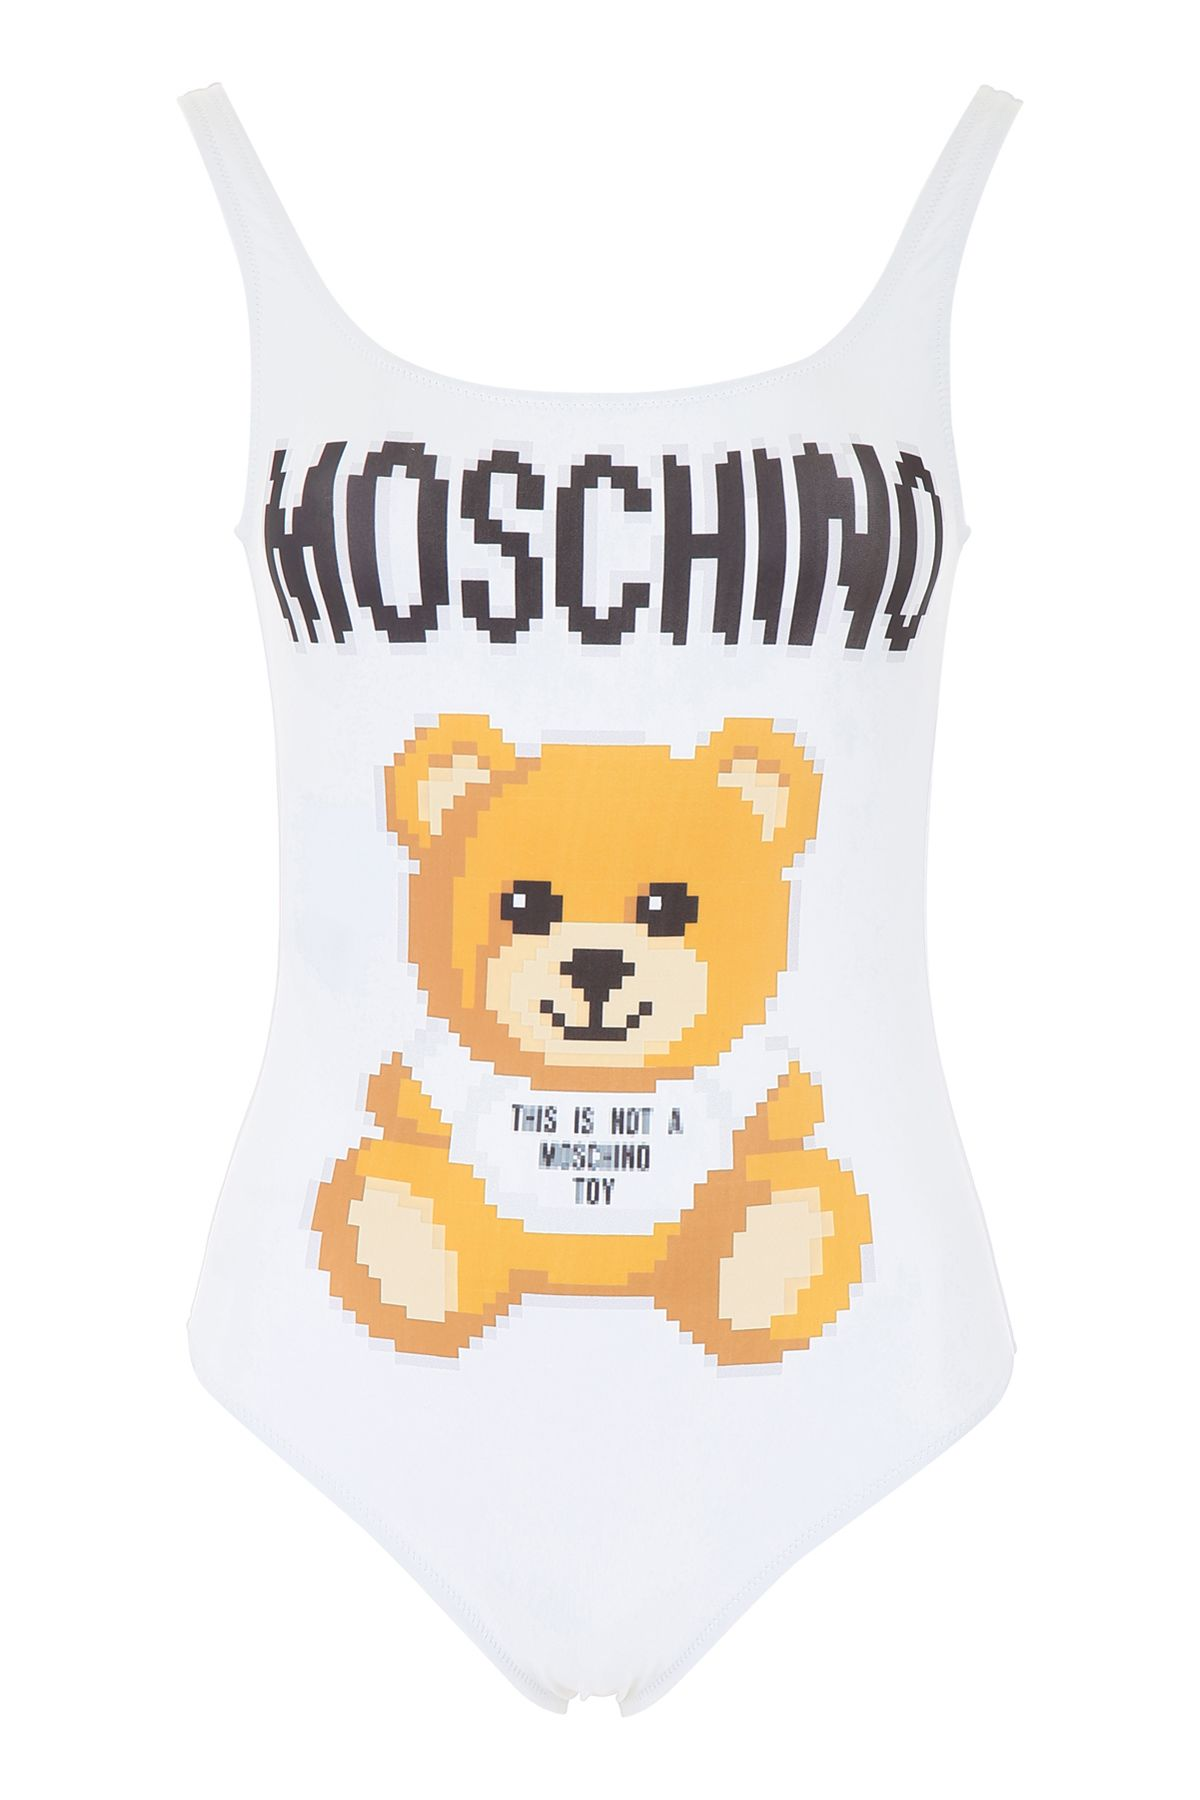 f6accb81f0bae Moschino Moschino Teddy Bear Swimsuit - FANTASIA BIANCO (White ...